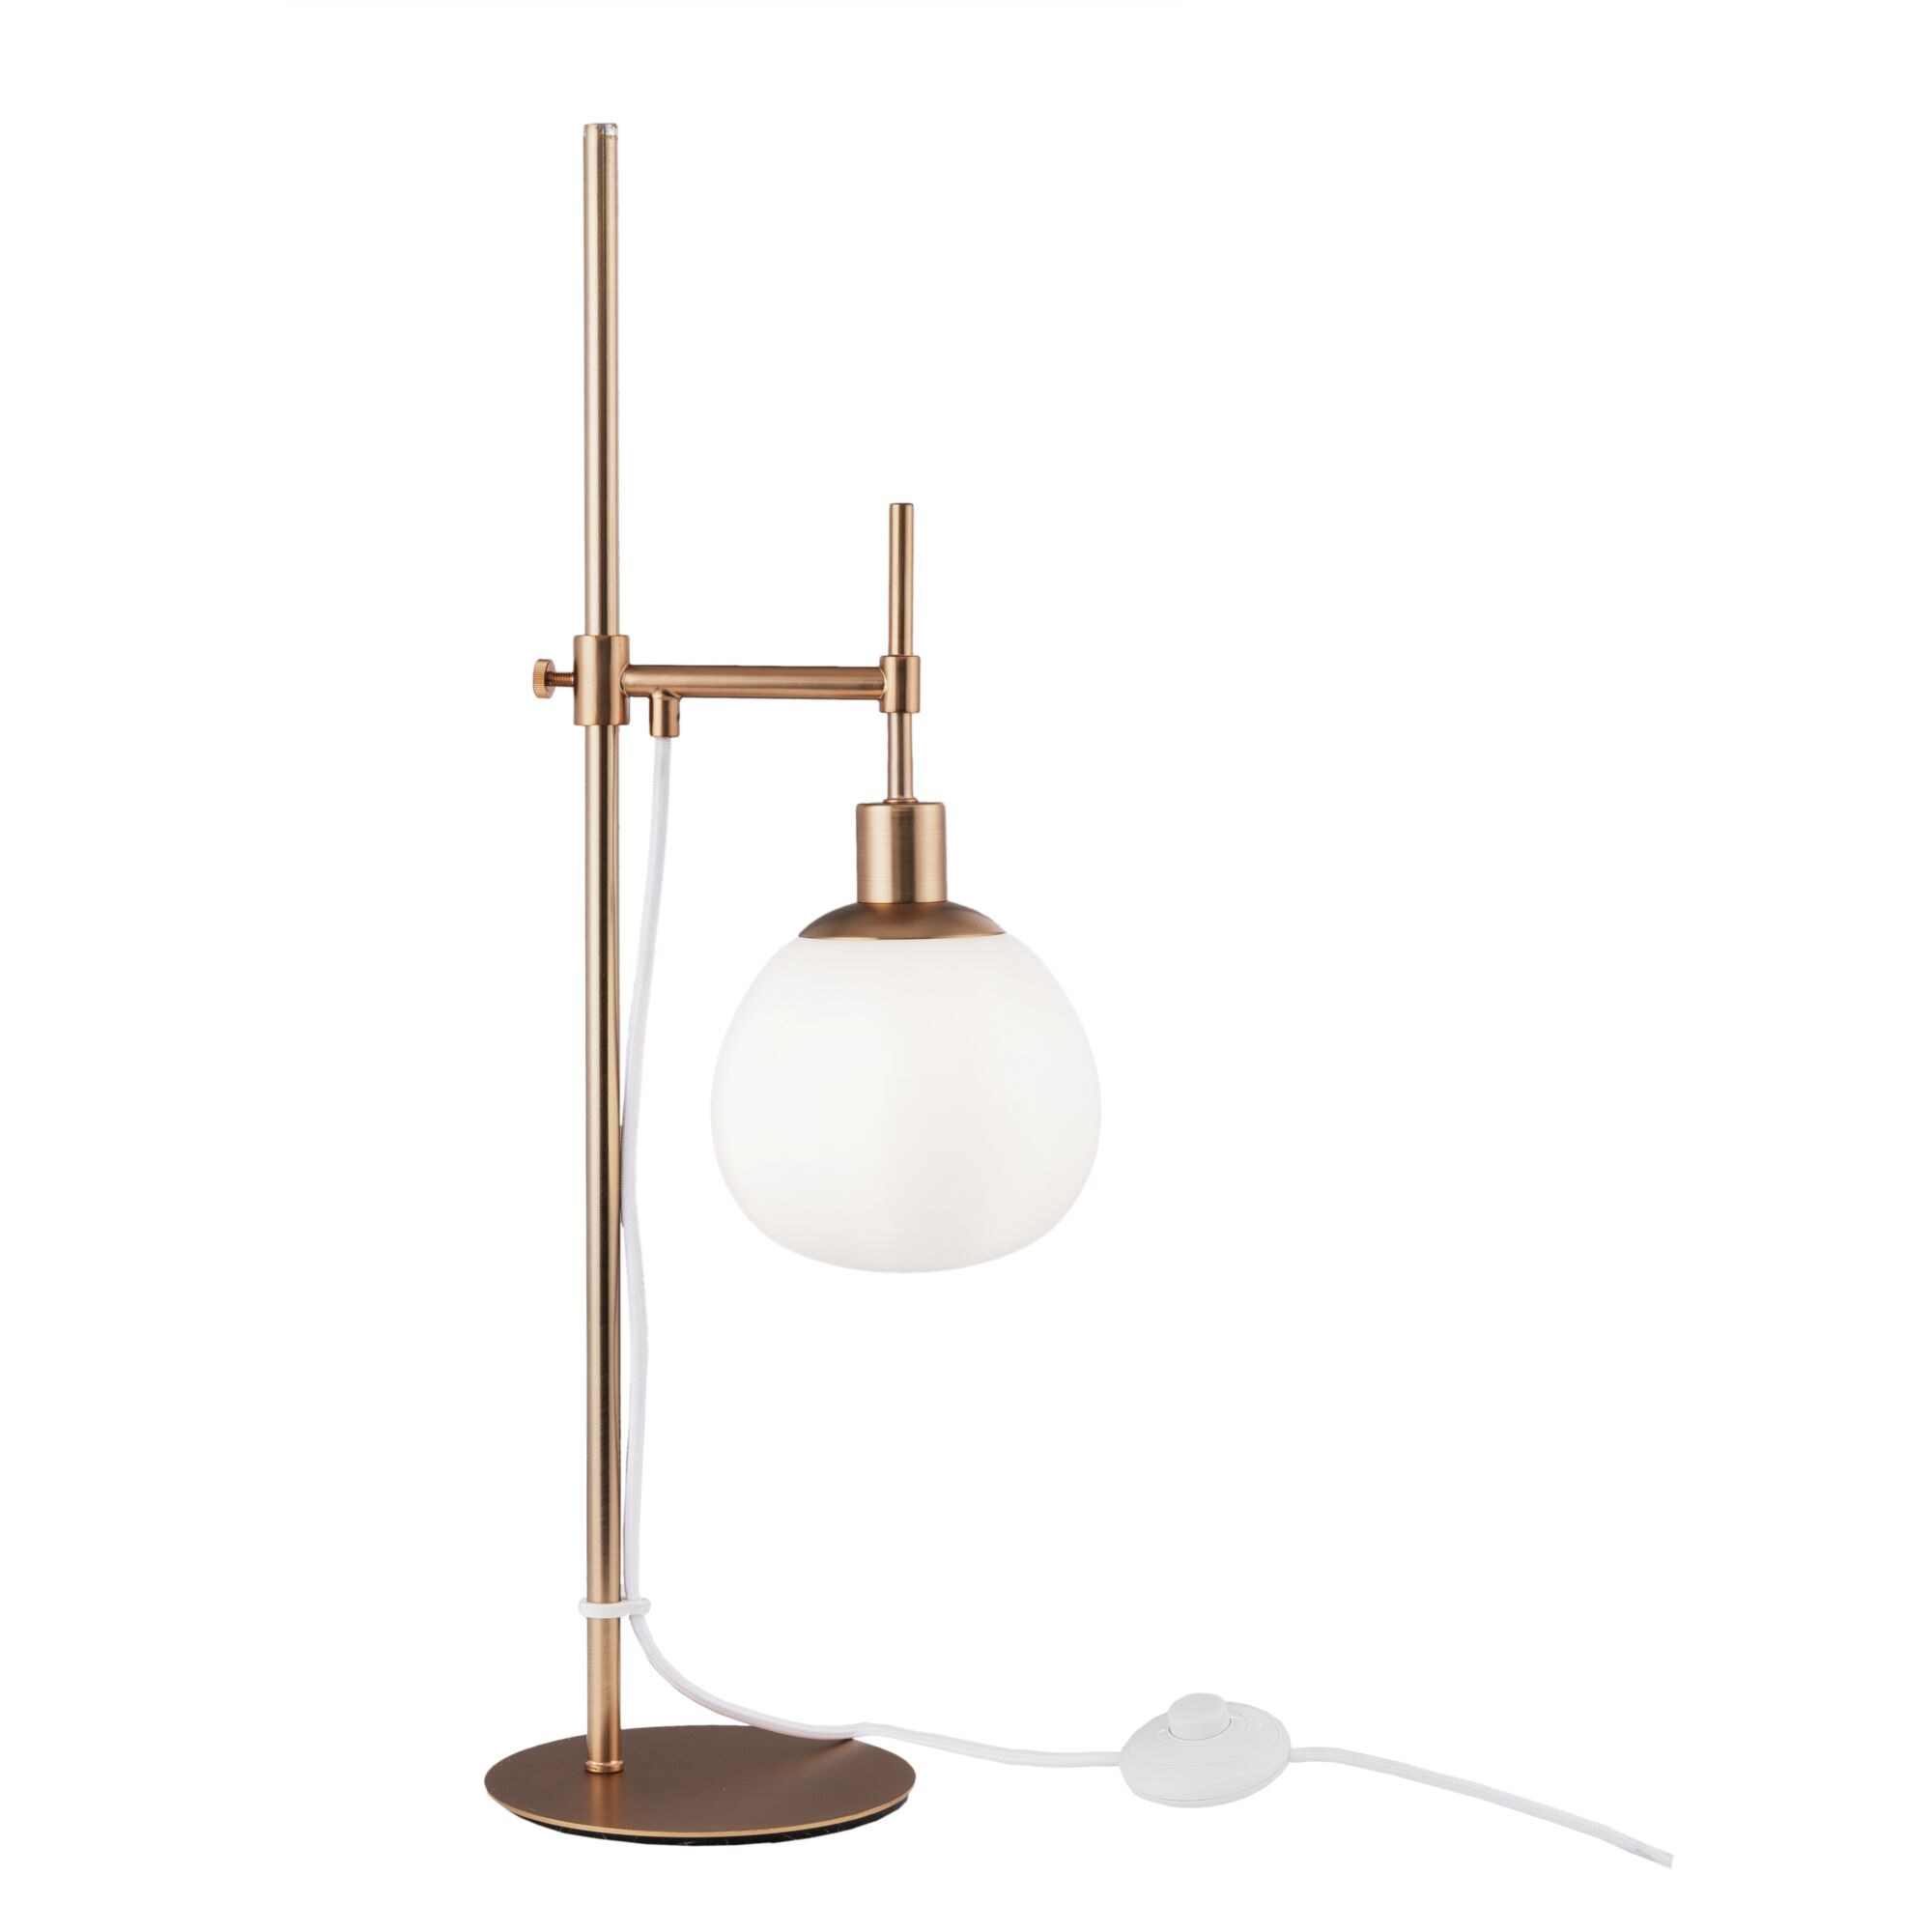 Настольная лампа Maytoni MOD221-TL-01-G Латунь 1хE14х40W